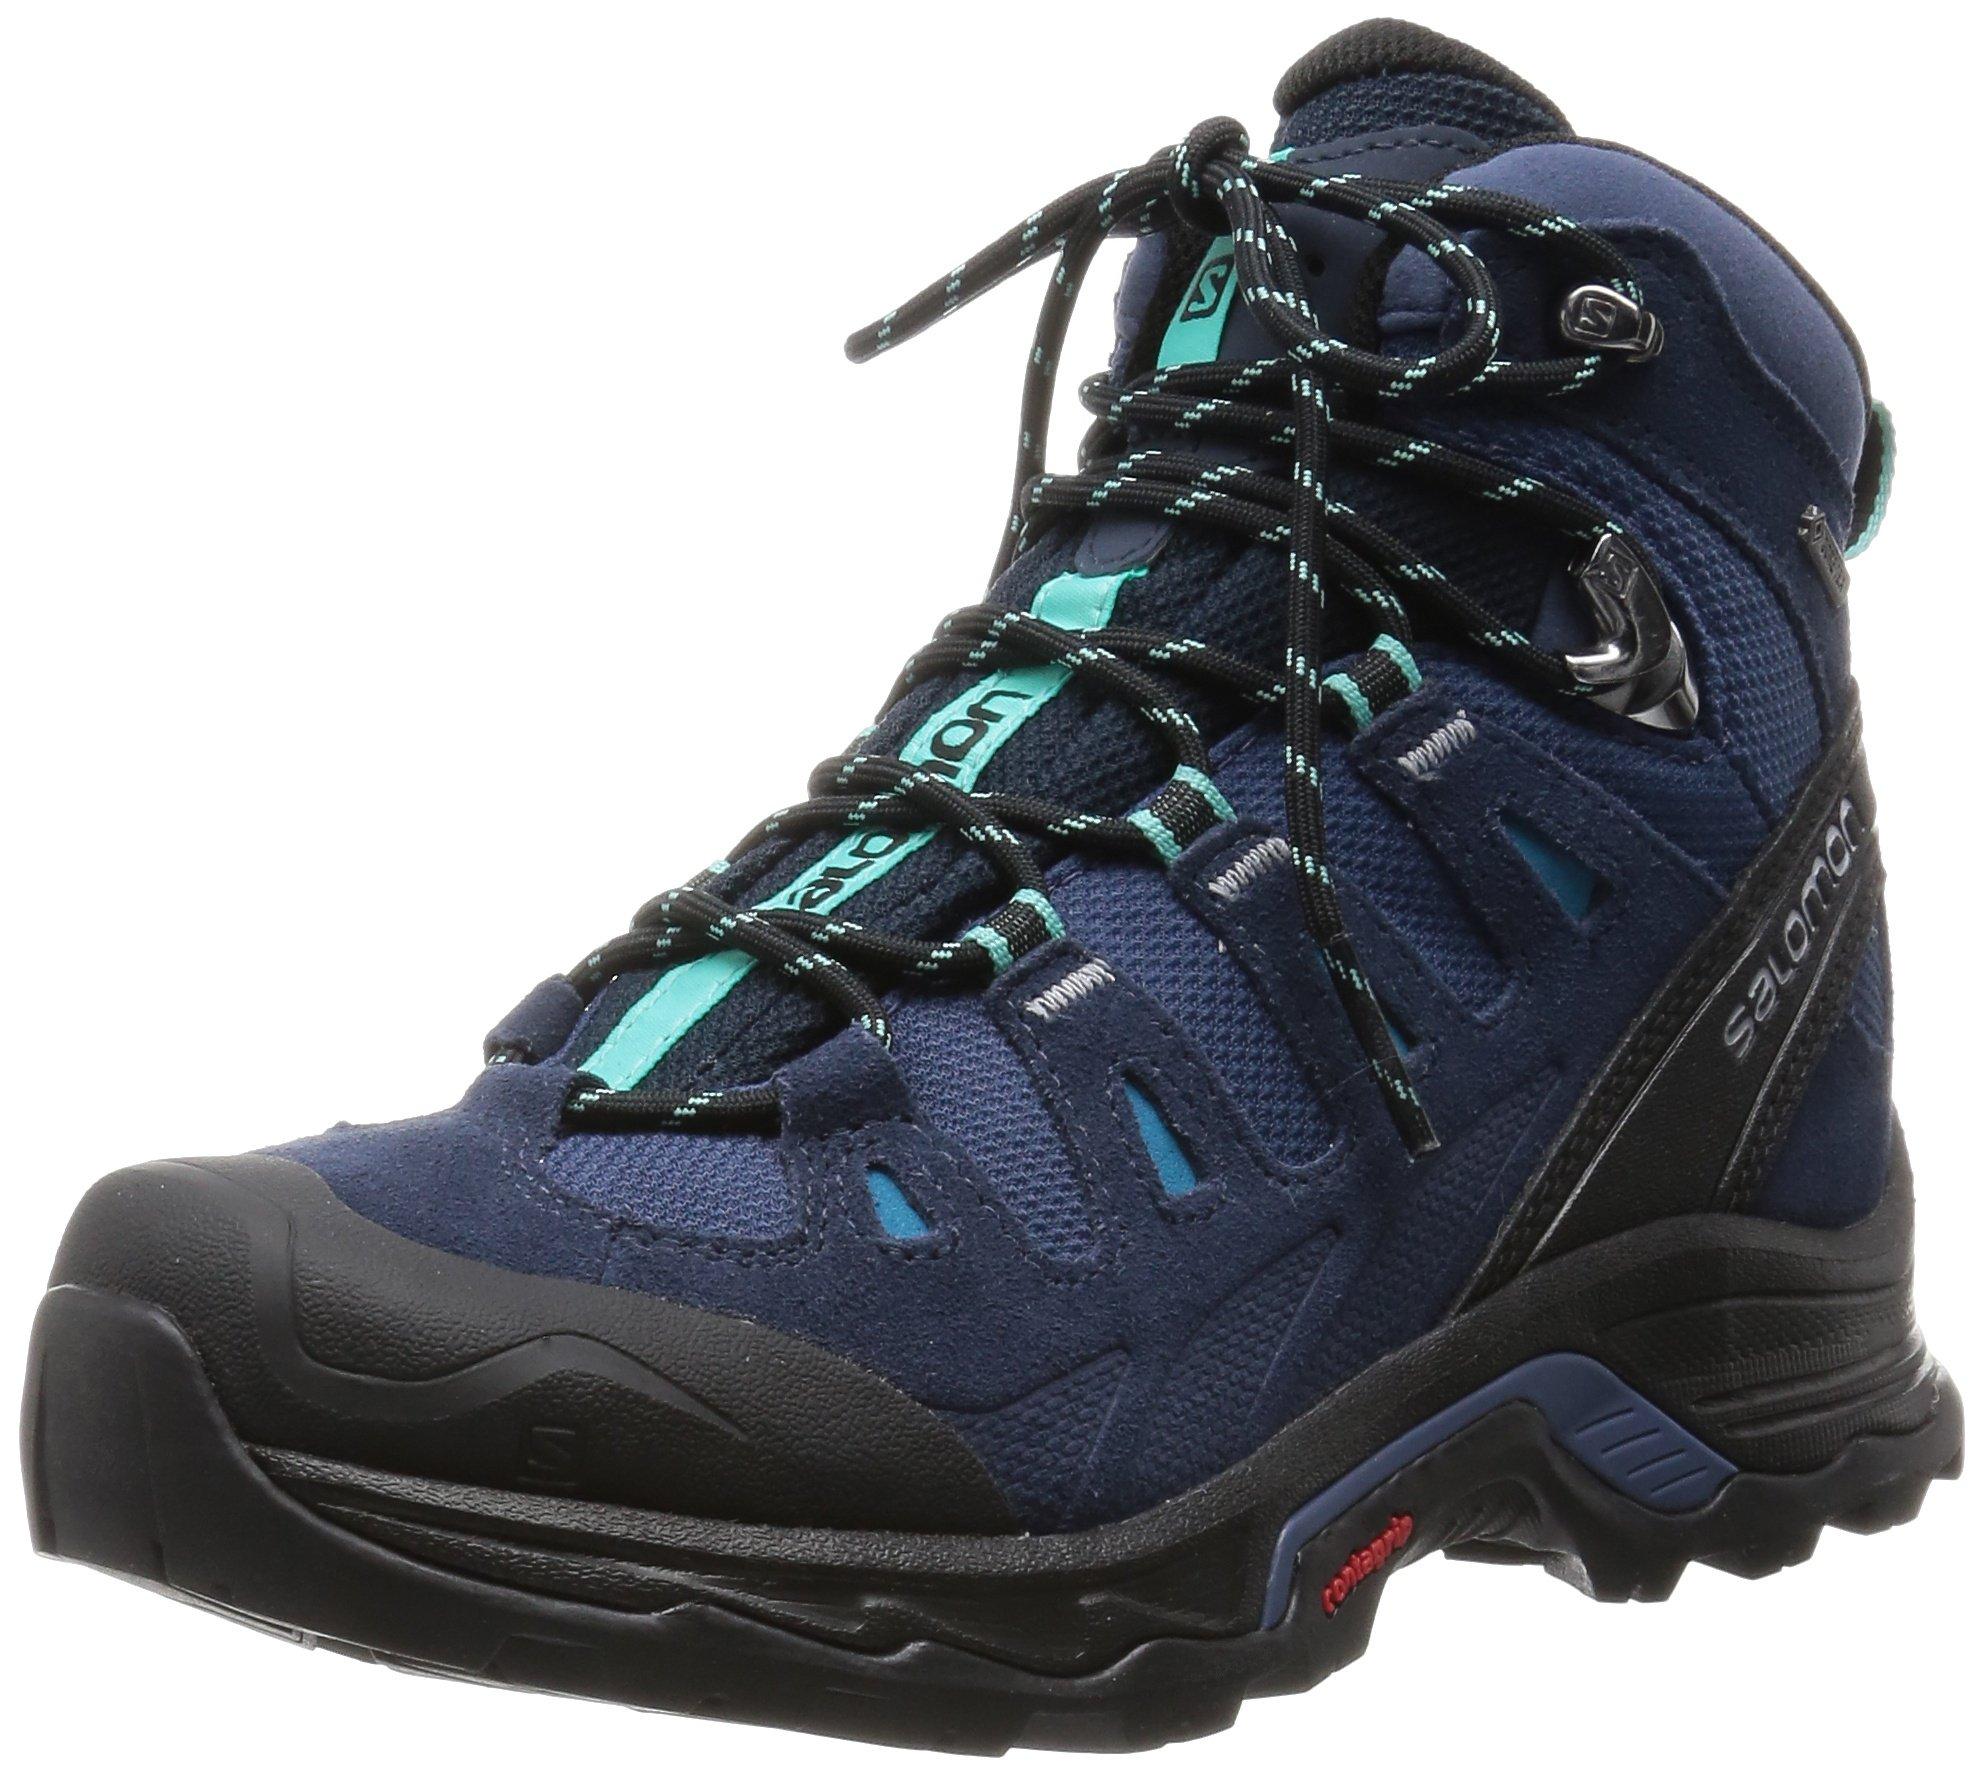 Salomon Women's Quest Prime GTX W Backpacking Boot, Slateblue/Deep Blue/Bubble Blue, 8.5 B US